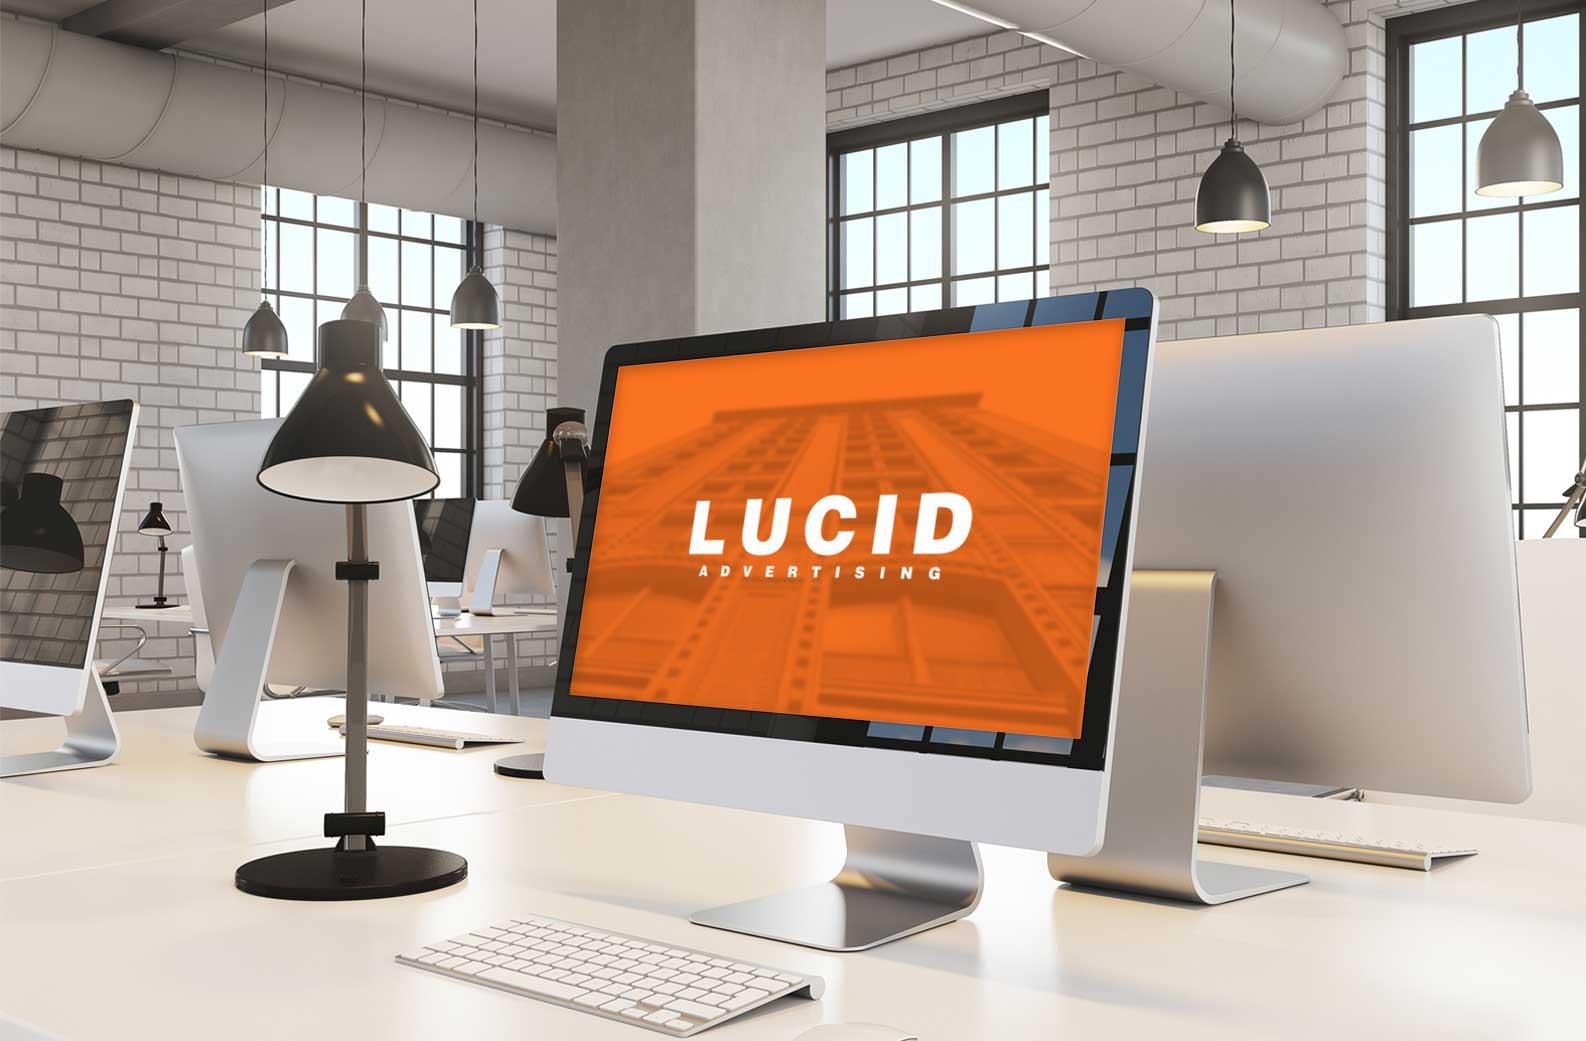 Lucid Advertising